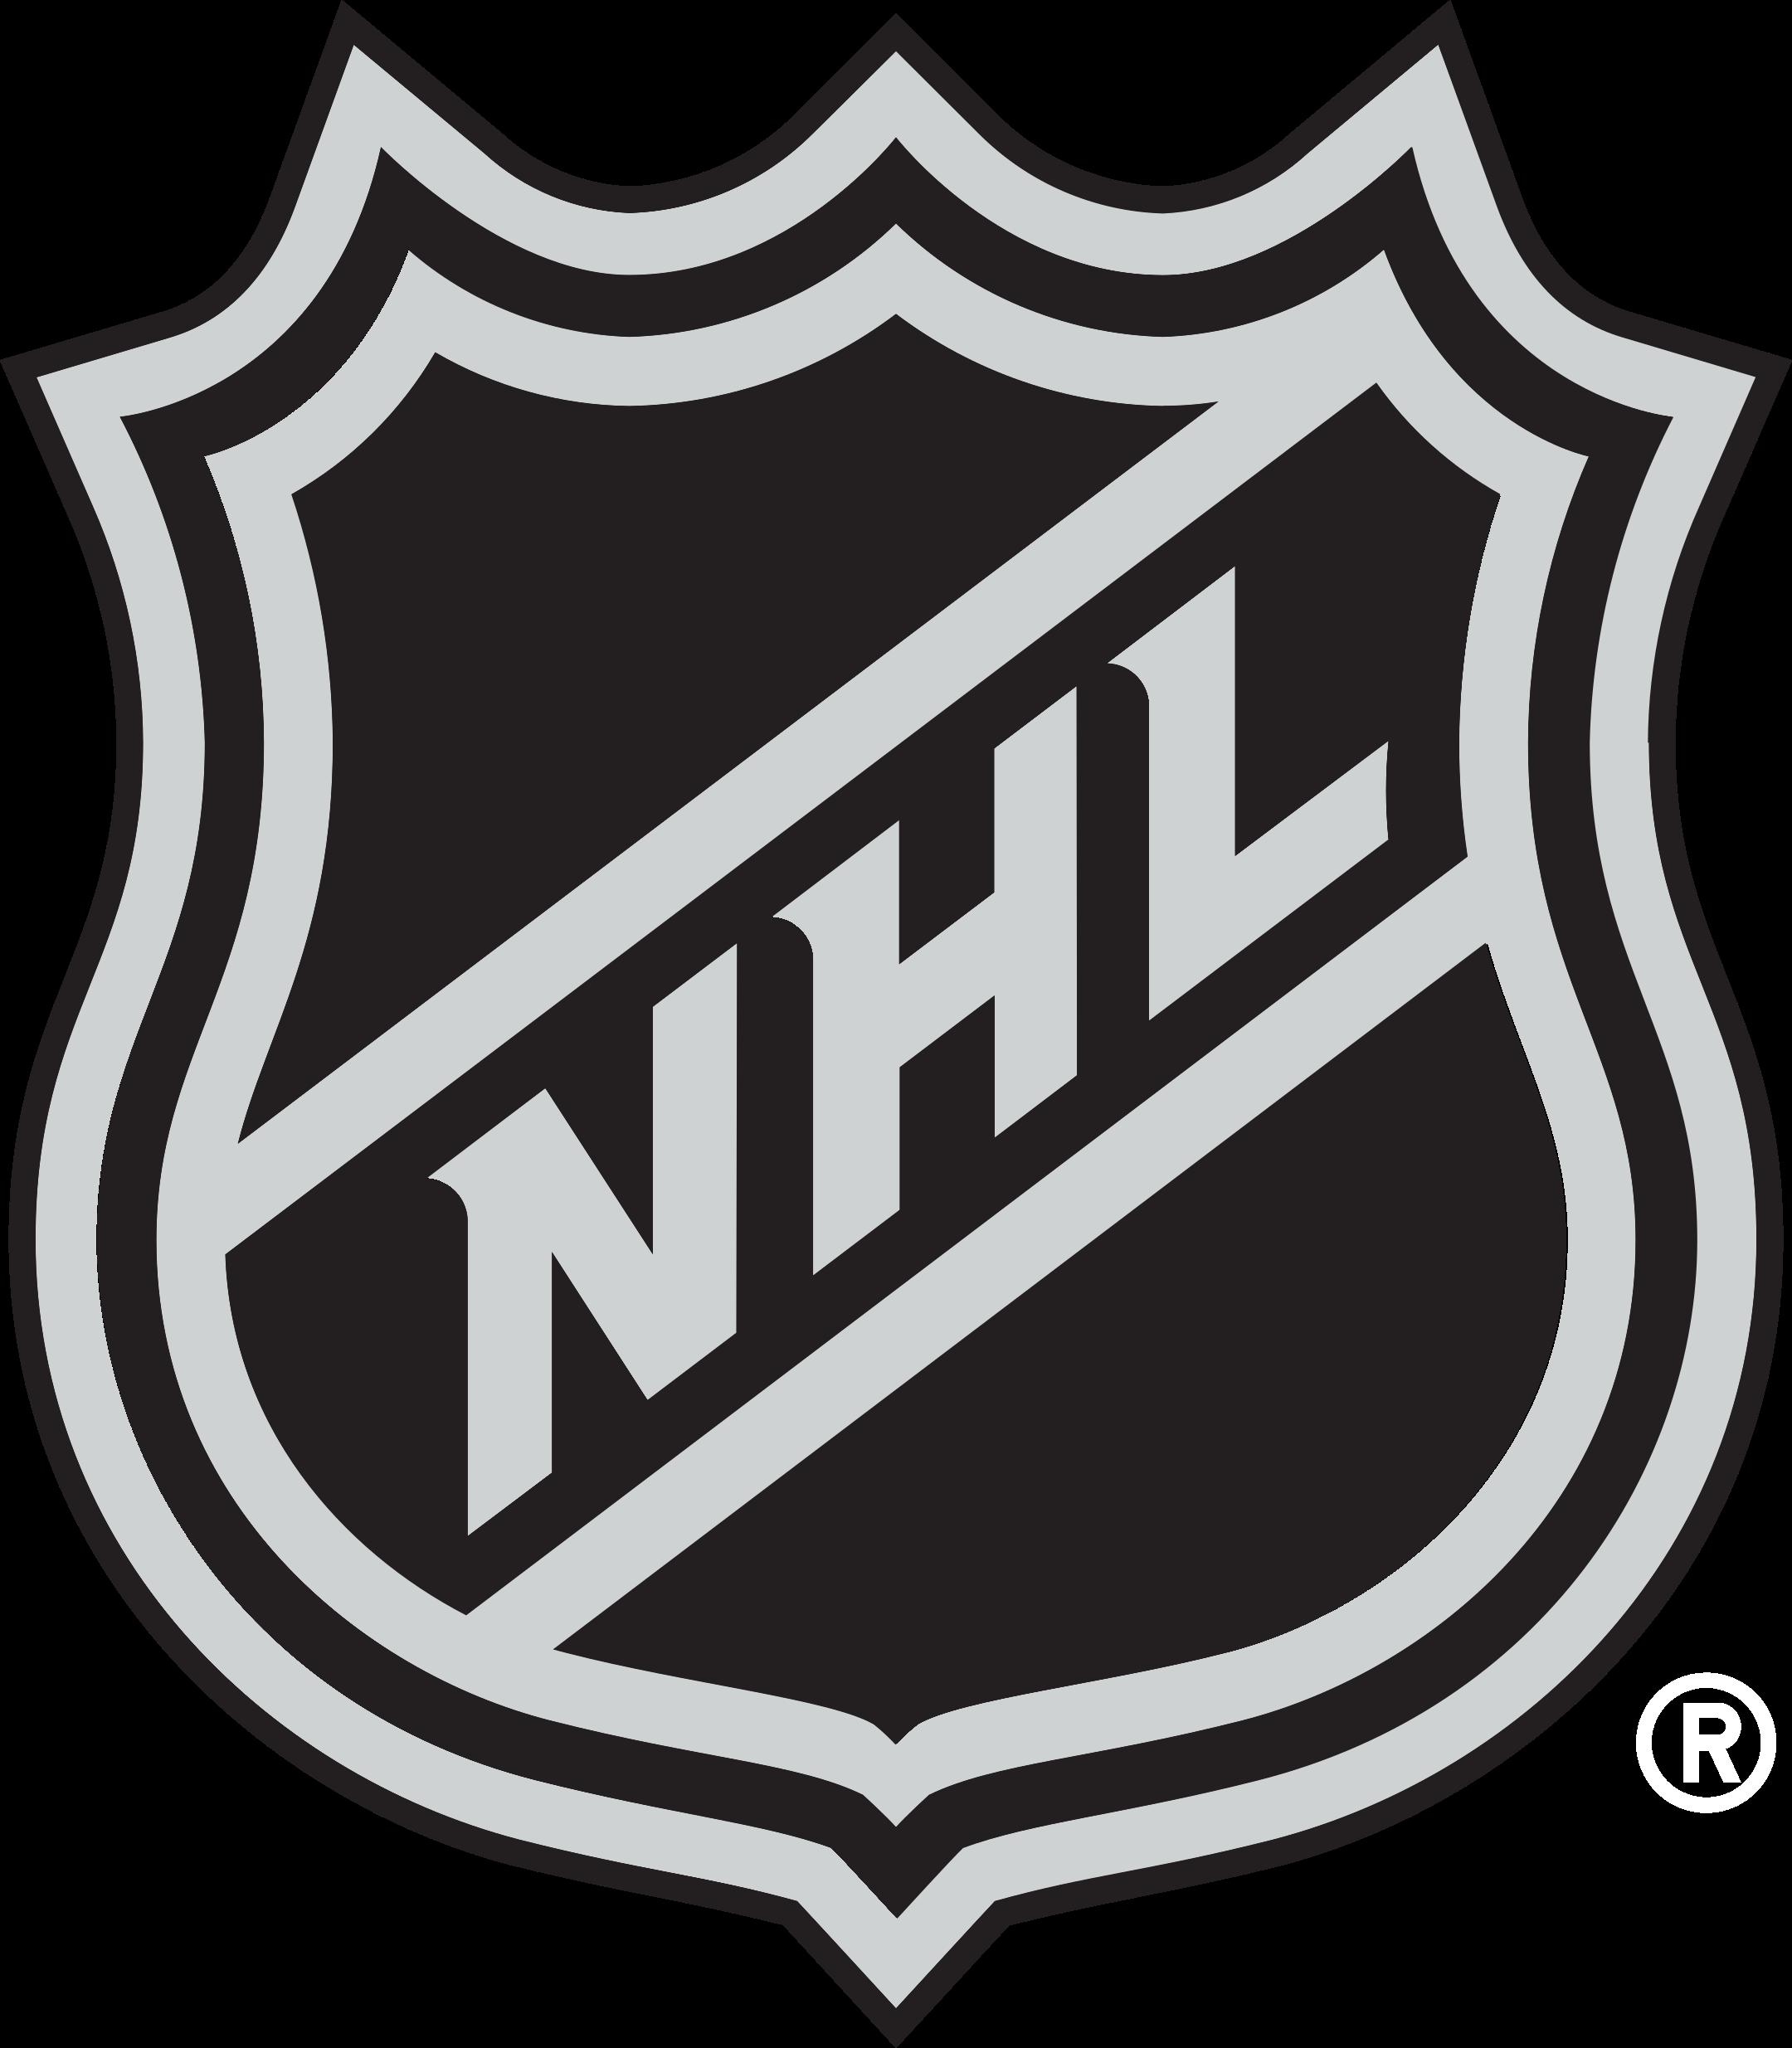 nhl logo 1 - NHL Logo - National Hockey League Logo